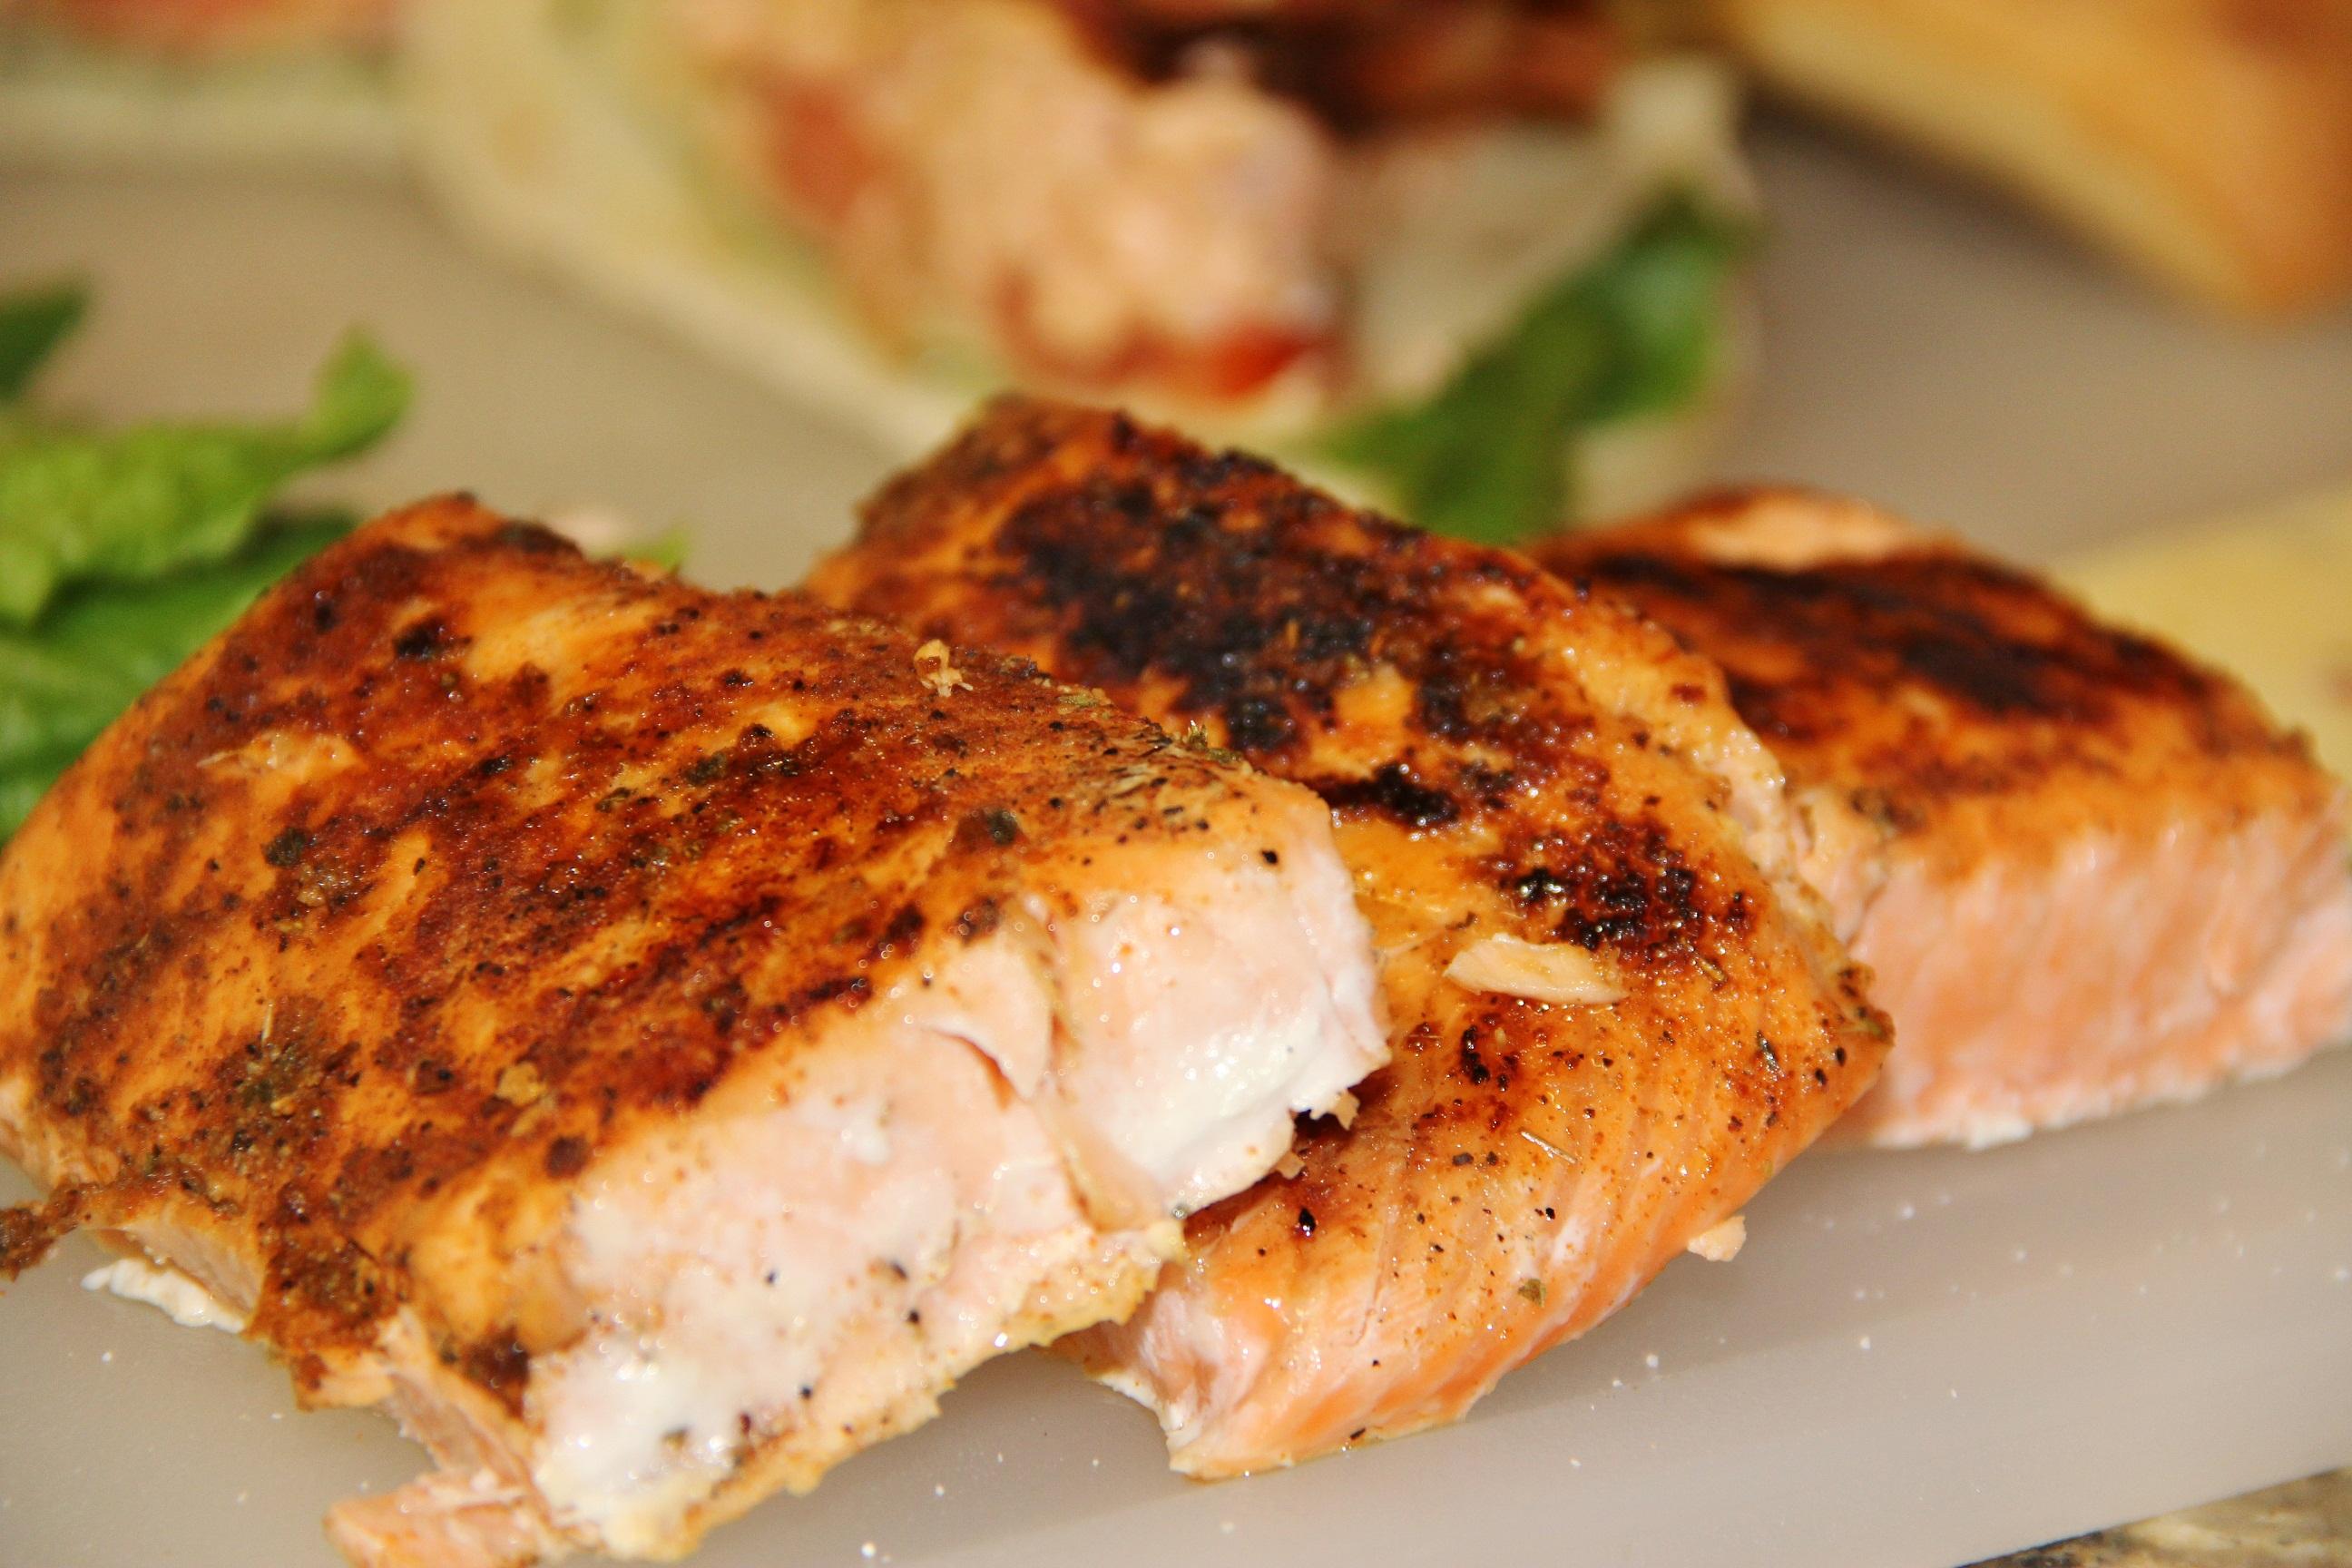 Blackened Salmon for Salmon BLT Sammies